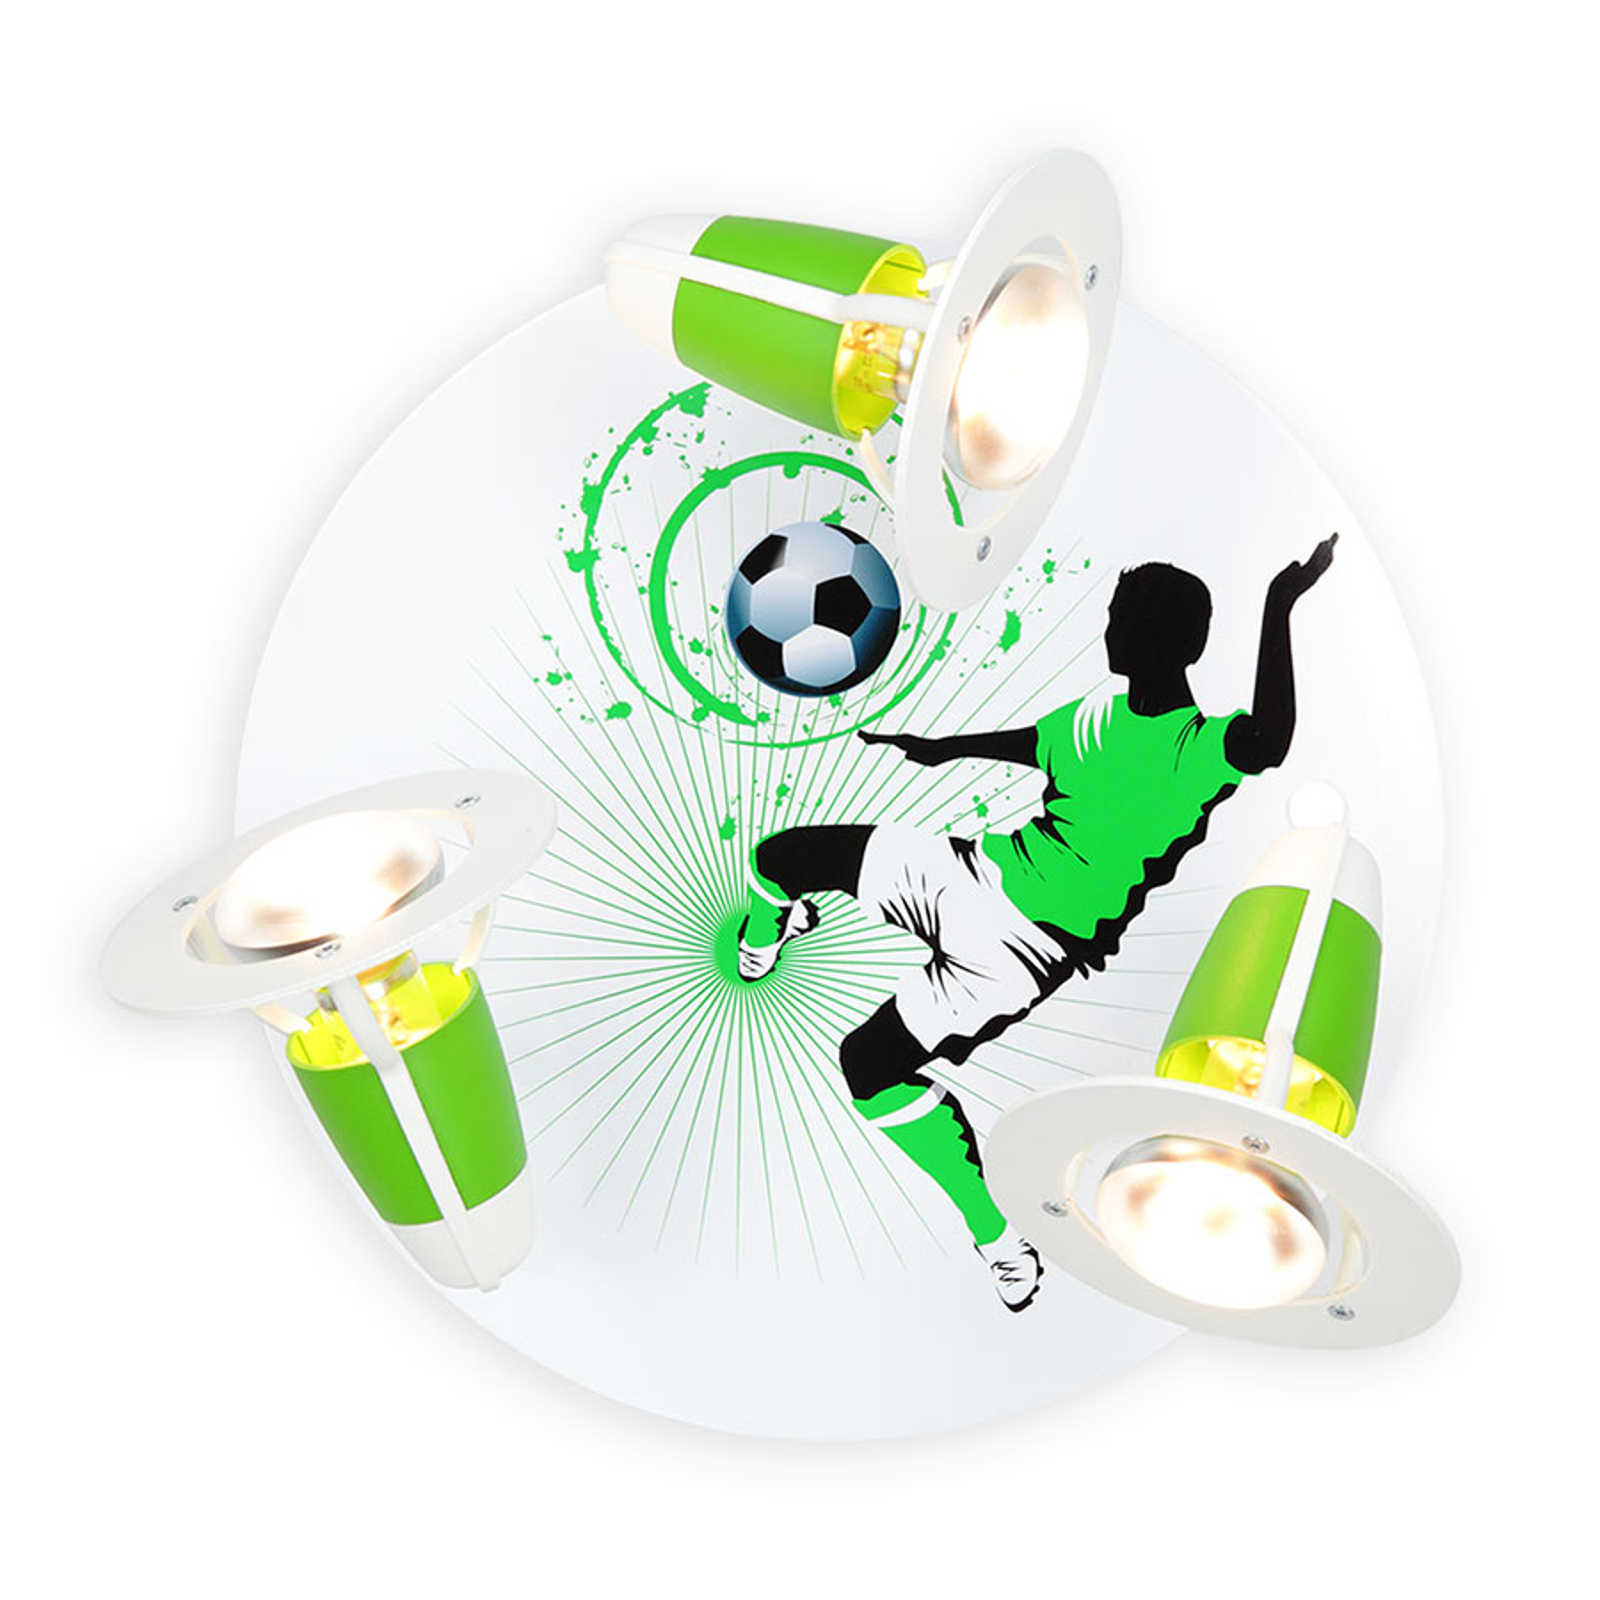 Lampa sufitowa Soccer, 3-punktowa, zielono-biała